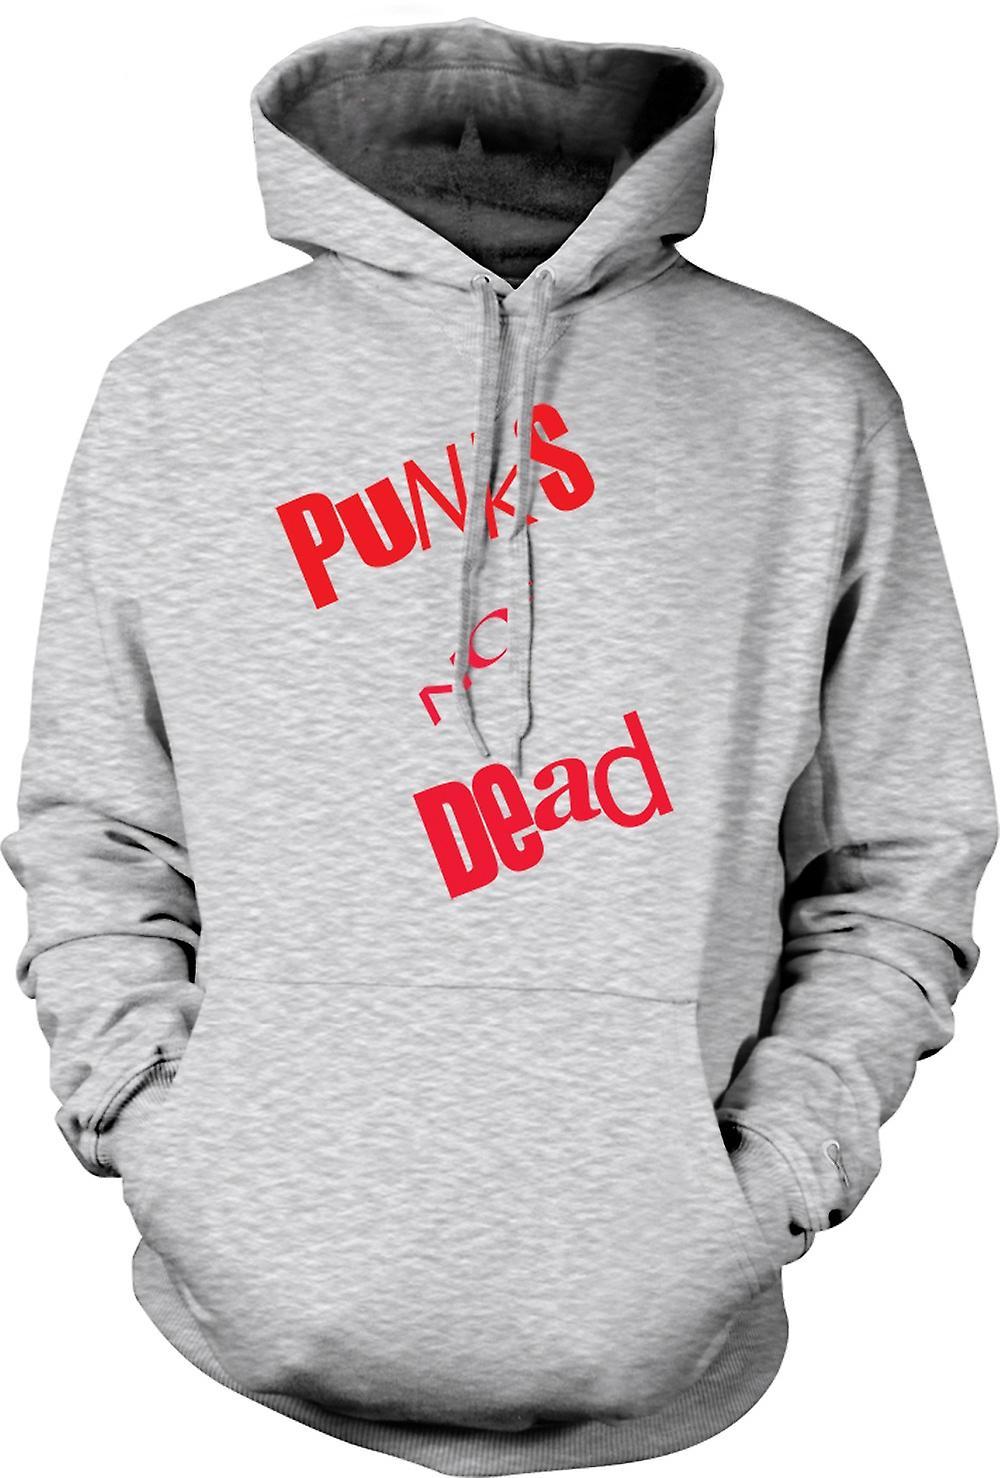 Mens Hoodie - Punks pas morts - Punk